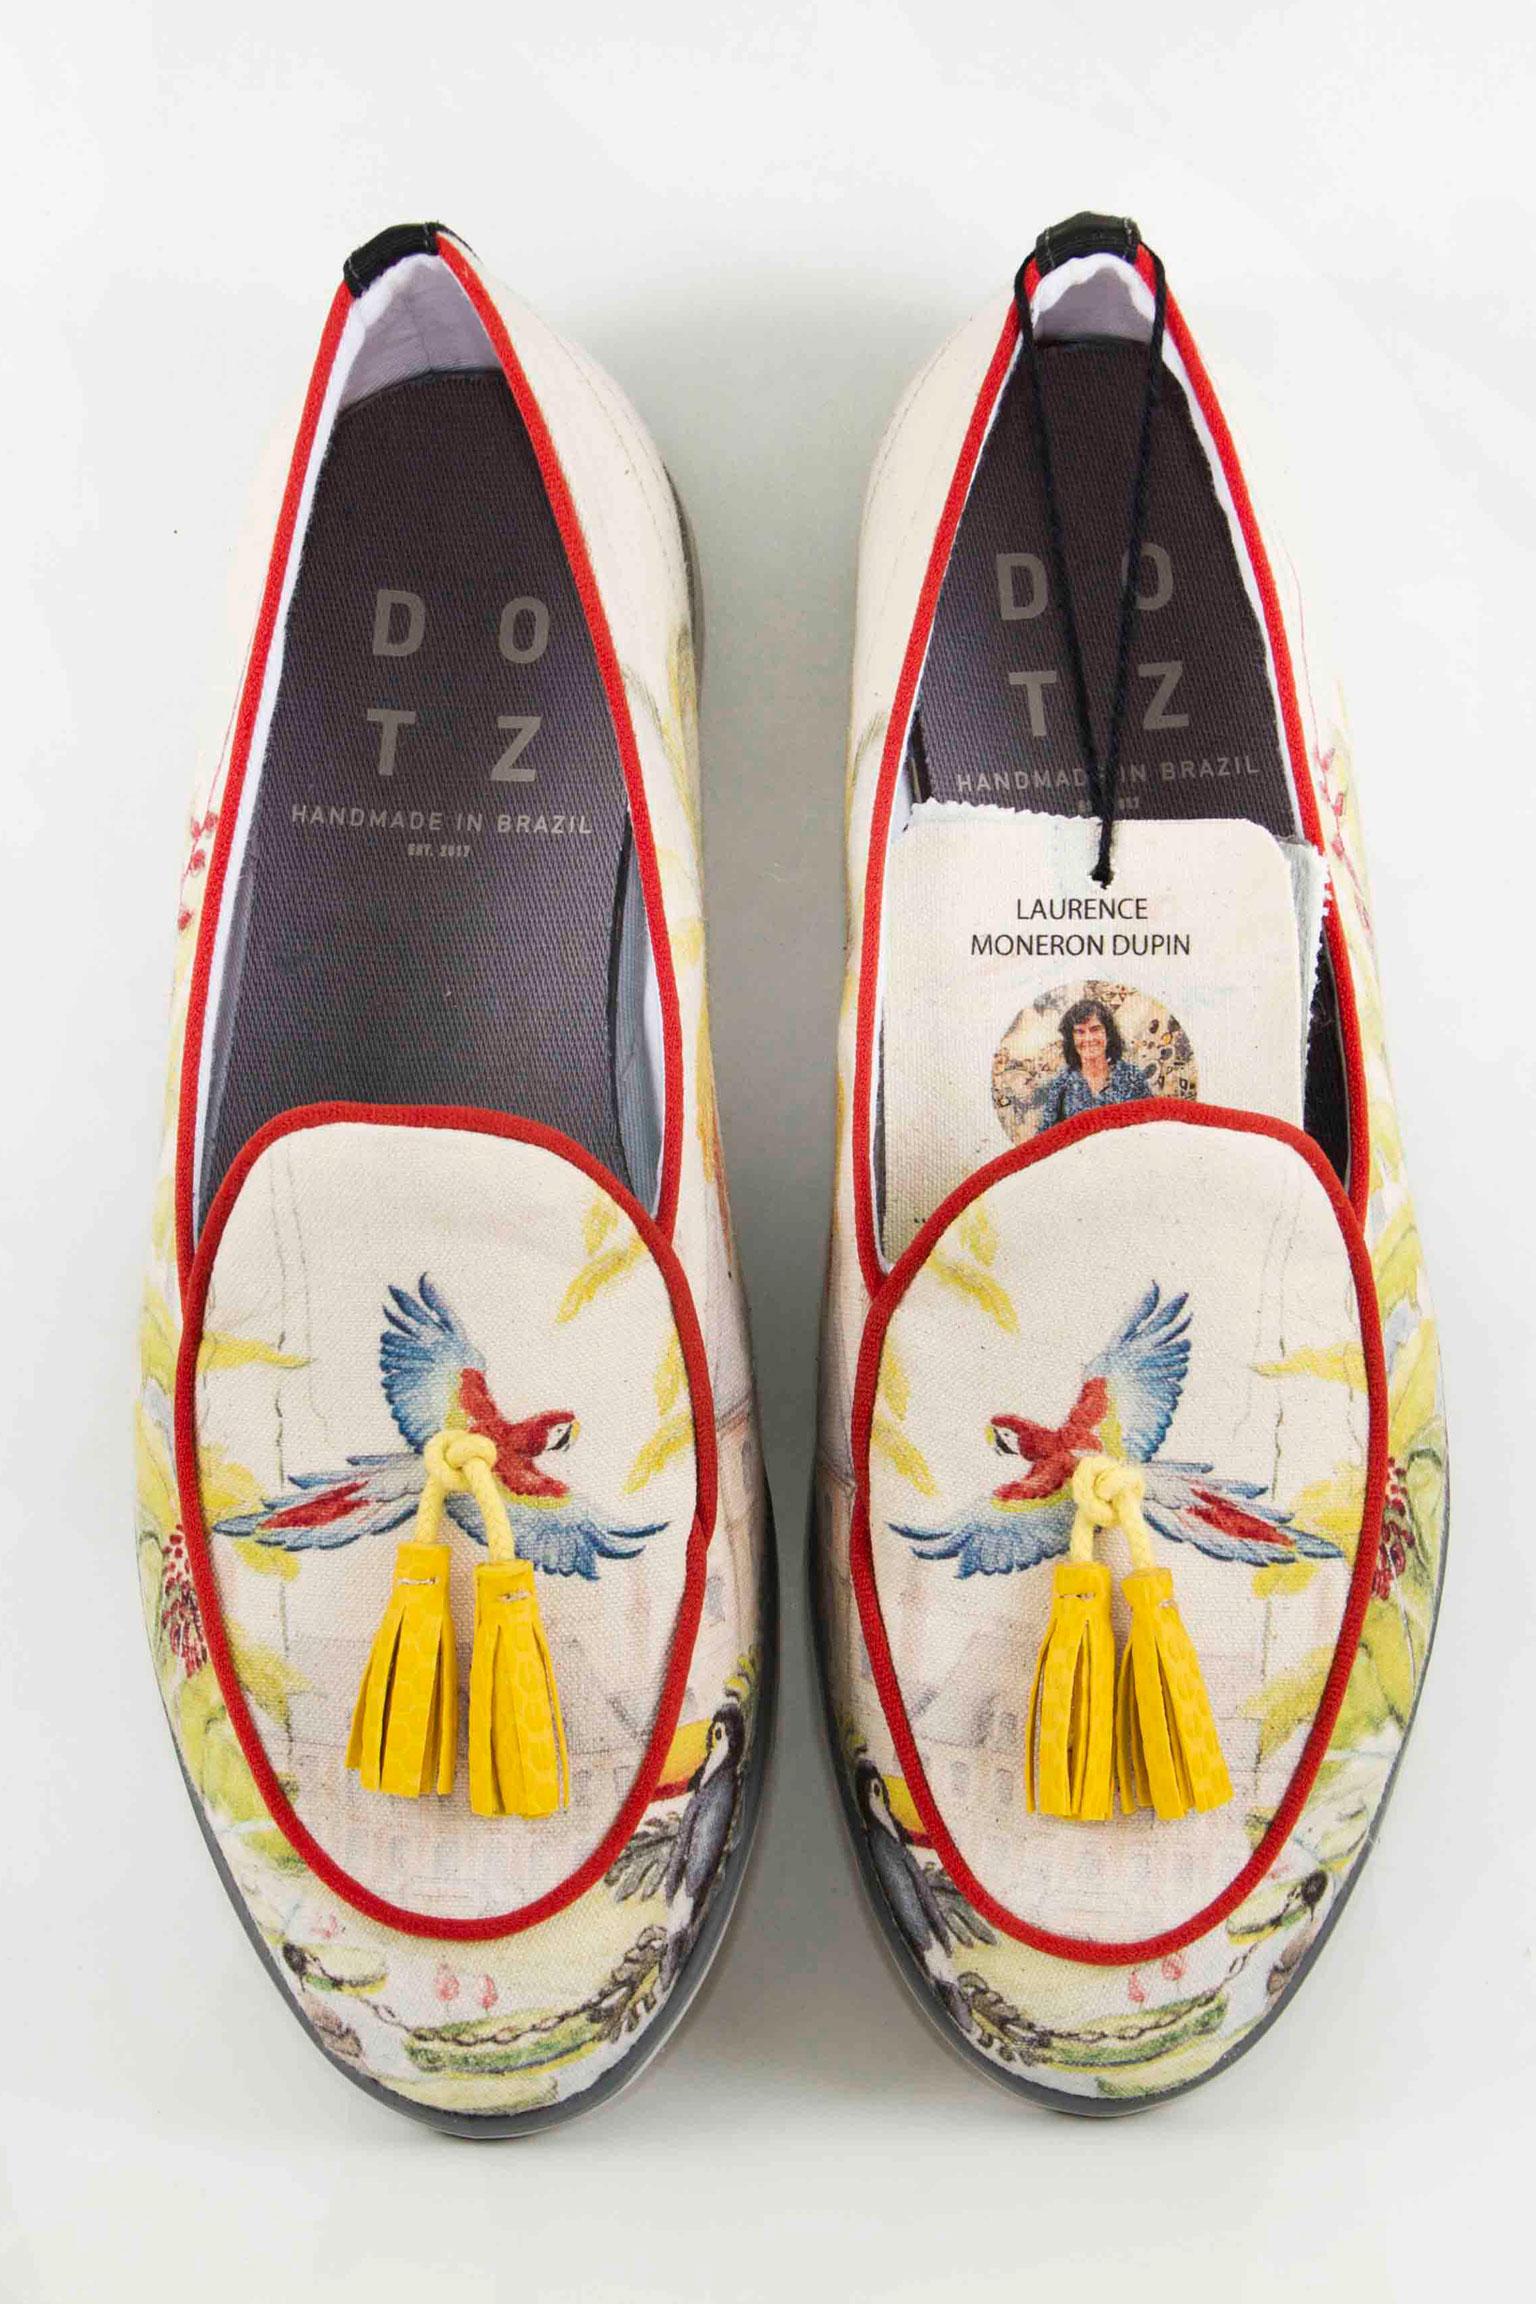 Dotz-scarpe-donna-fenice-fronte